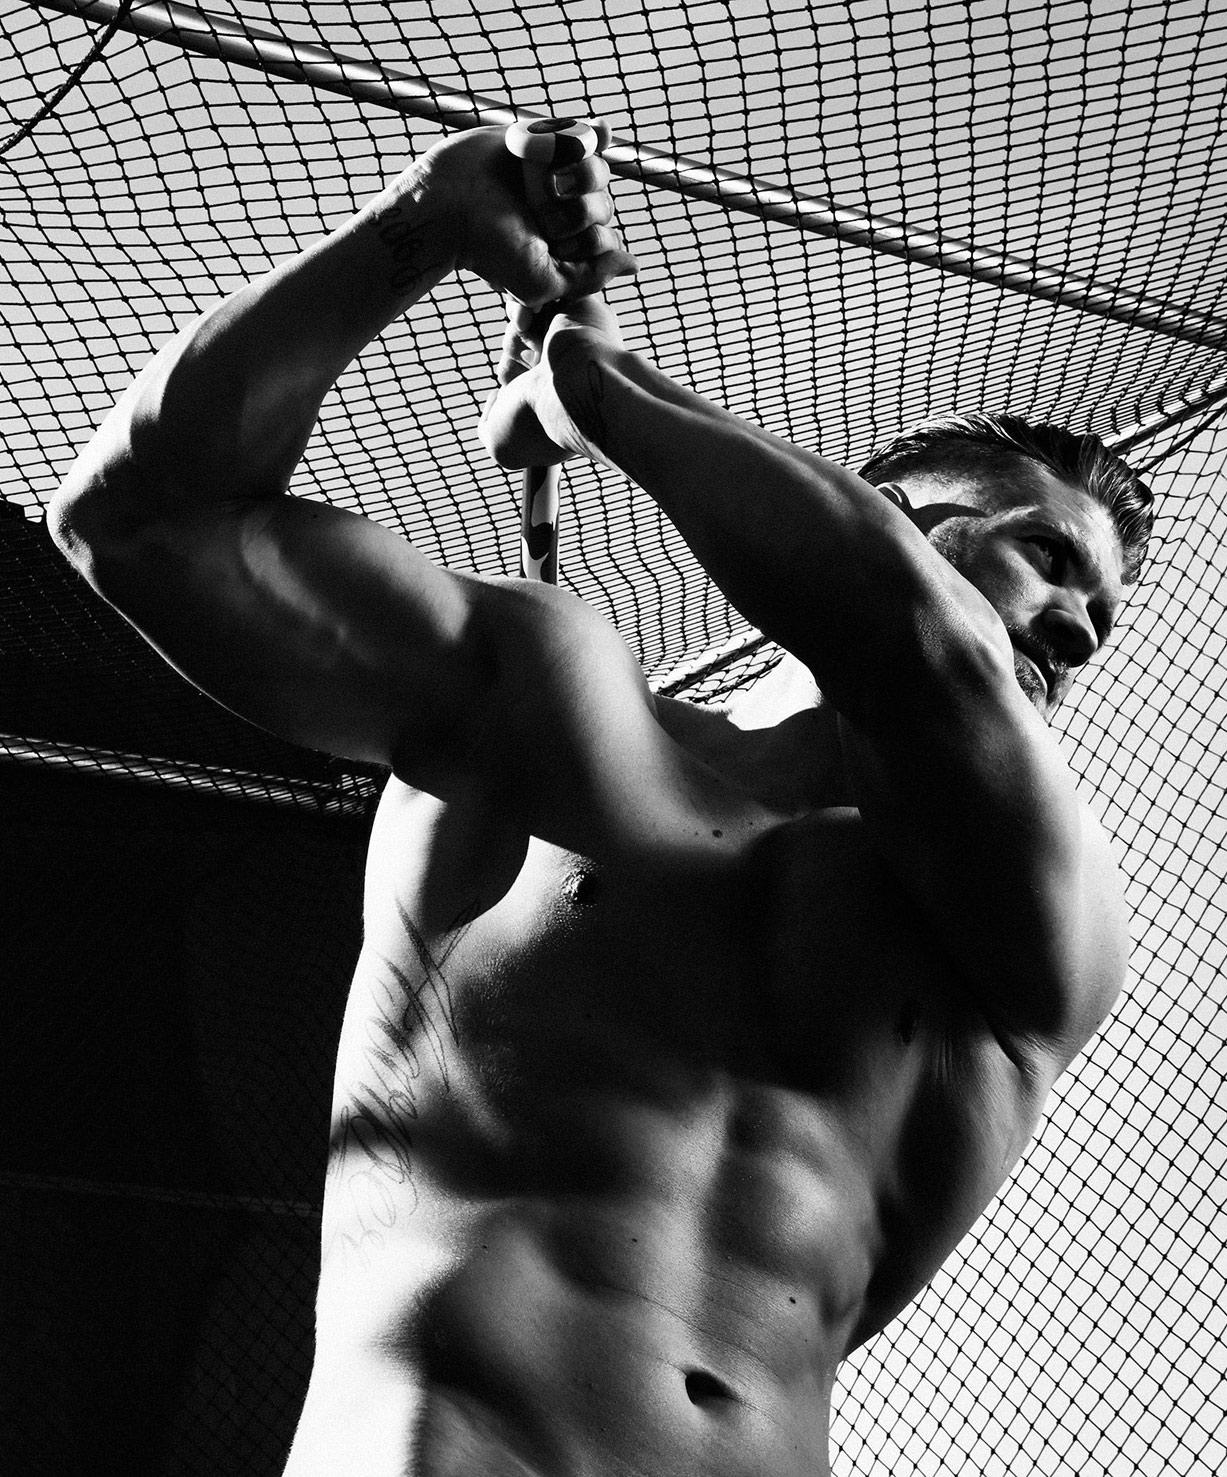 ESPN Magazine The Body Issue 2015 - Bryce Harper / Брайс Харпер - Культ тела журнала ESPN